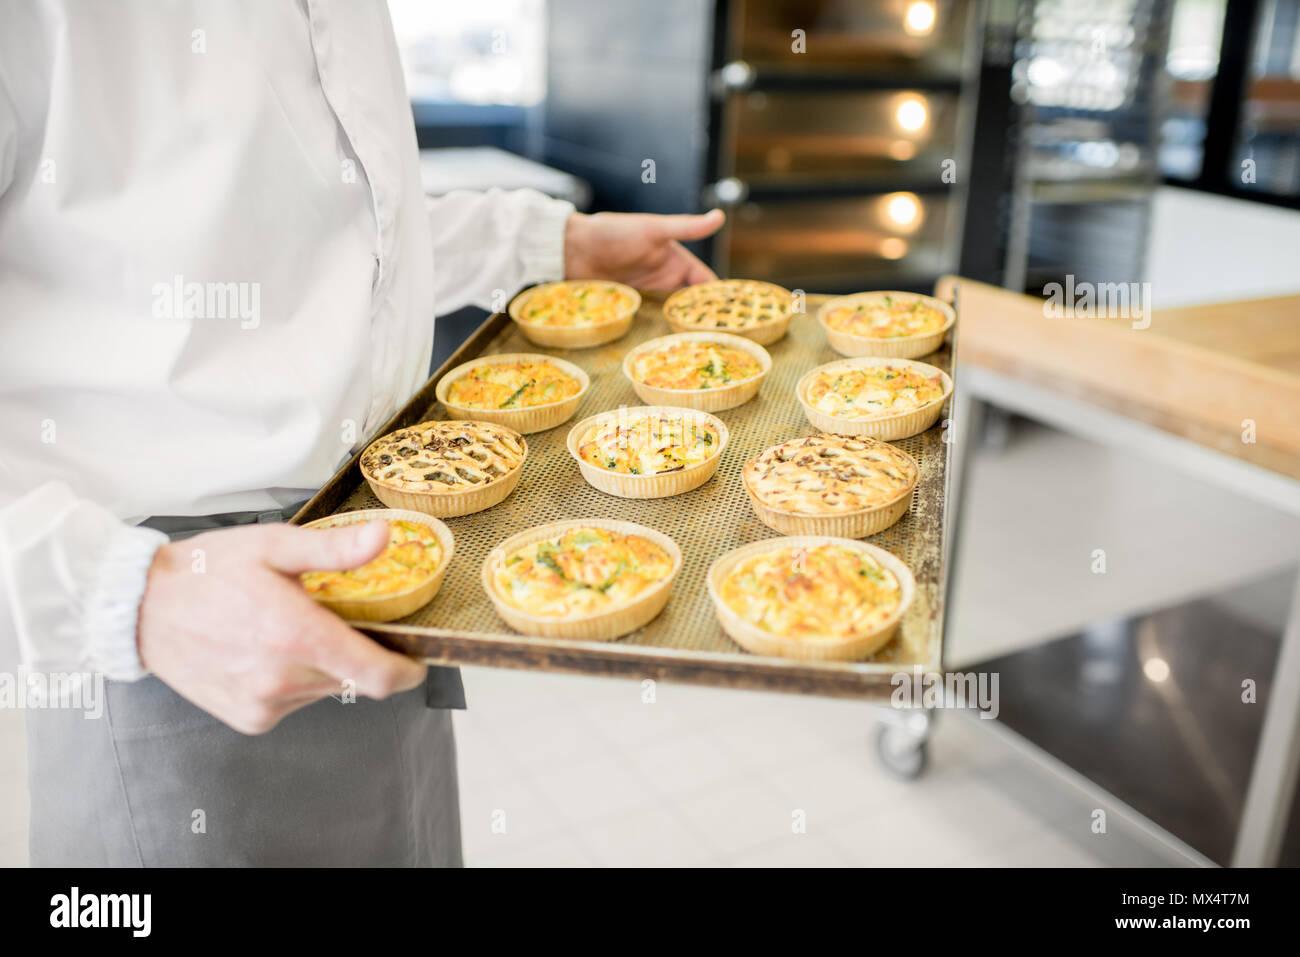 Holding tray with pains fraîchement cuits au four Photo Stock